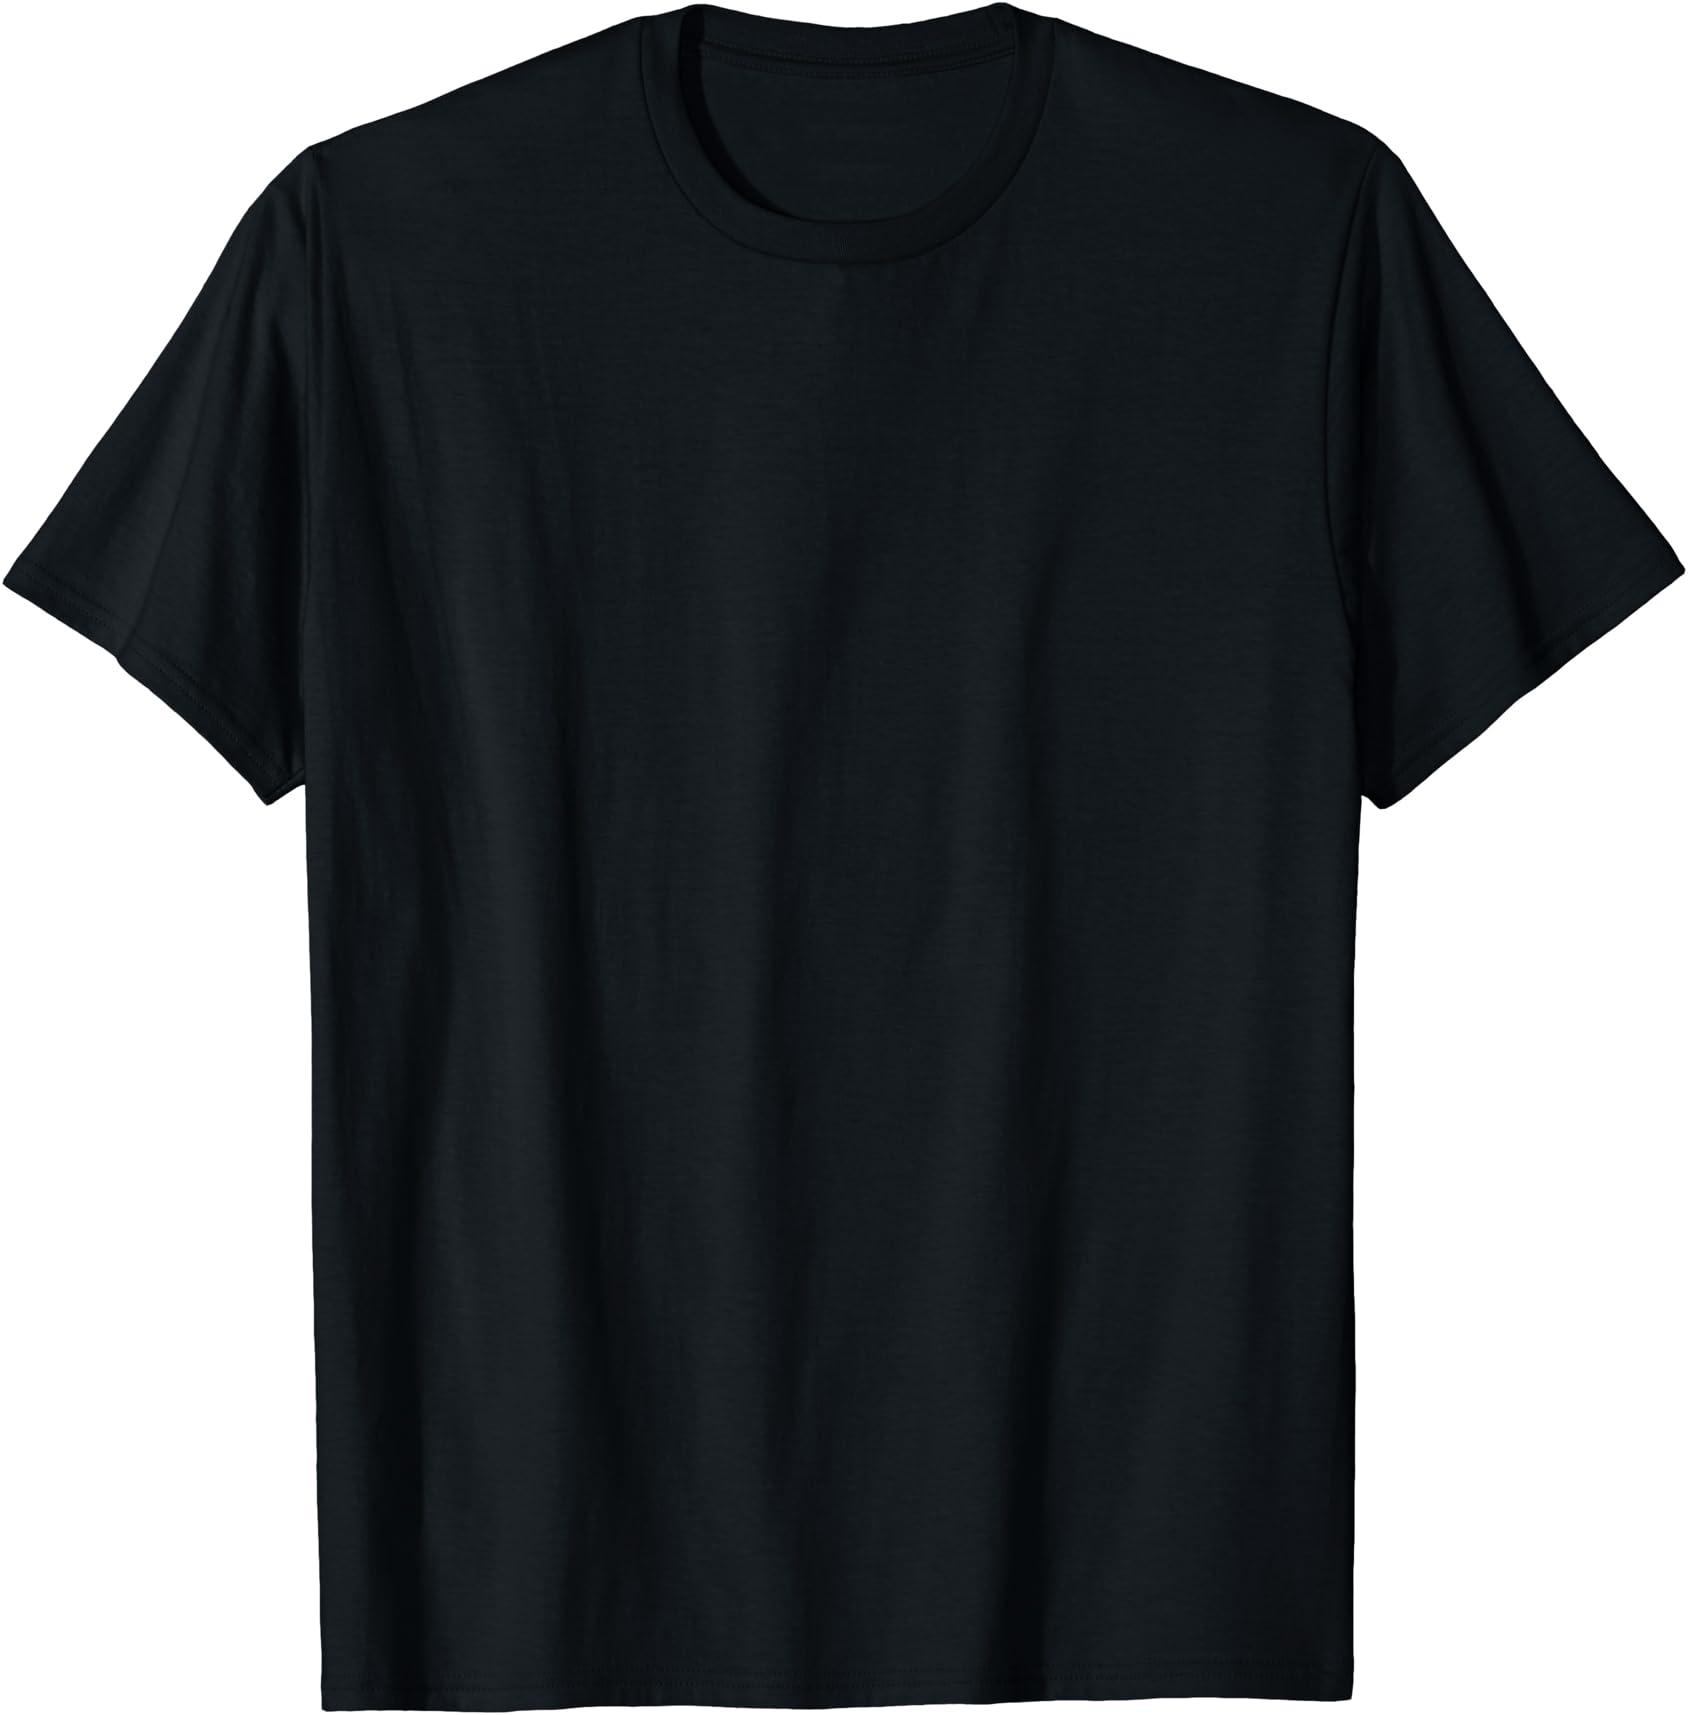 Kemeicle Womens Be Greater Than Average Nerd Math Dark Design Short Sleeves T Shirts